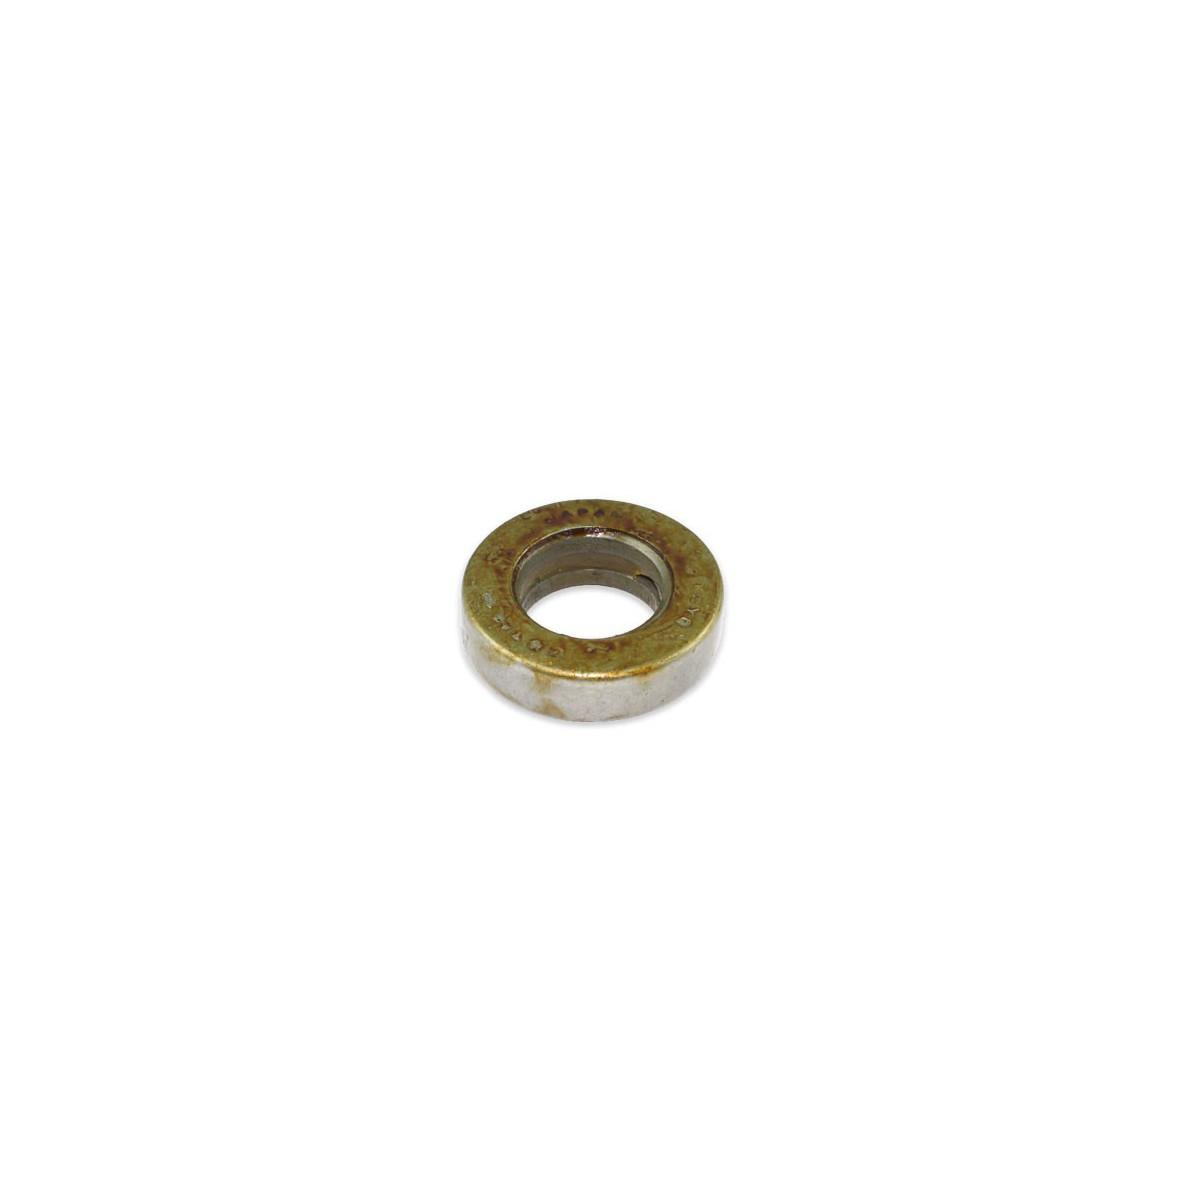 Thrust Bearing L2600 51,5x28,5x15,5